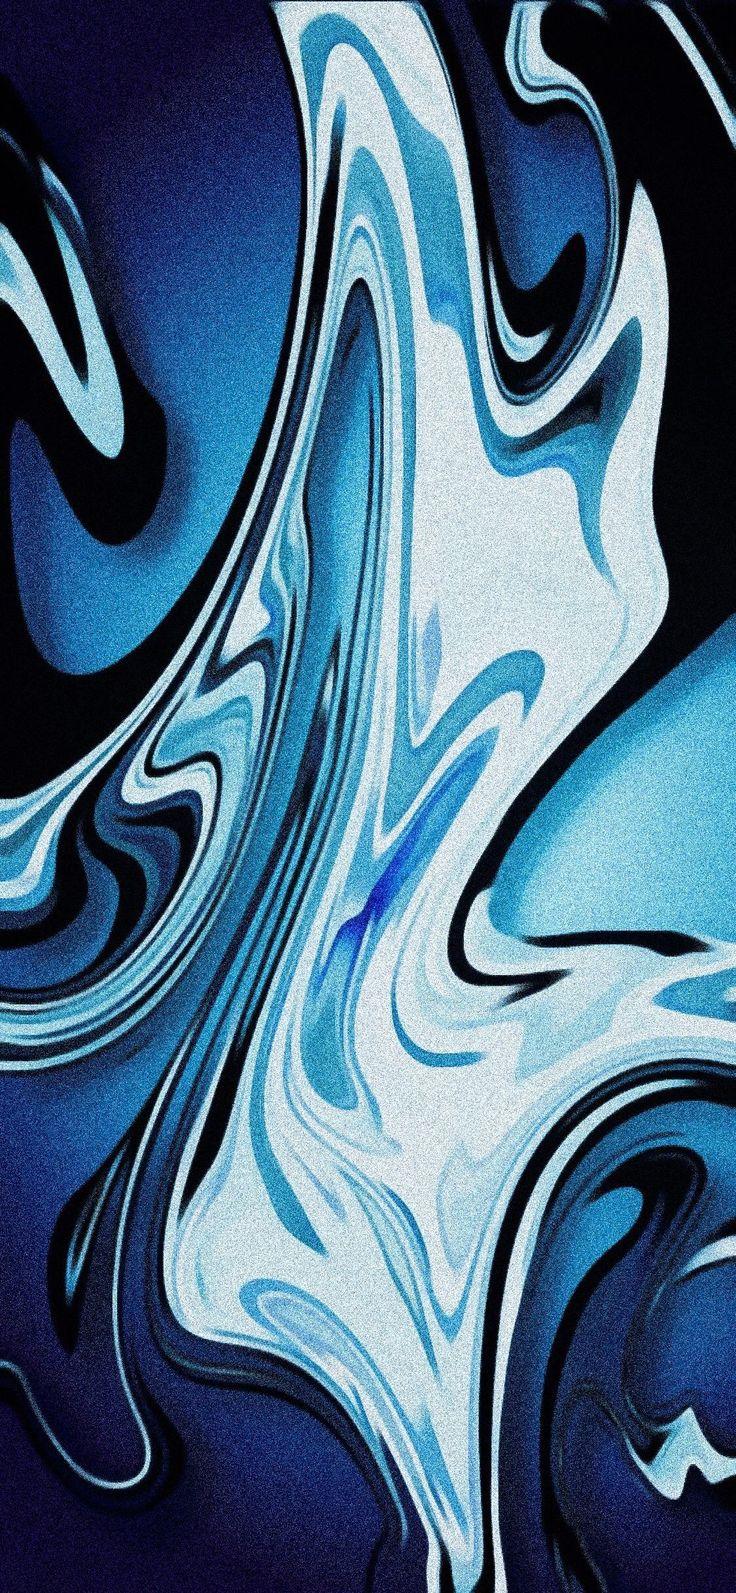 Liquid | iPhone X Wallpapers  #iphonexwallpaperfullhd #iphonexwallpaperhd1080p #...